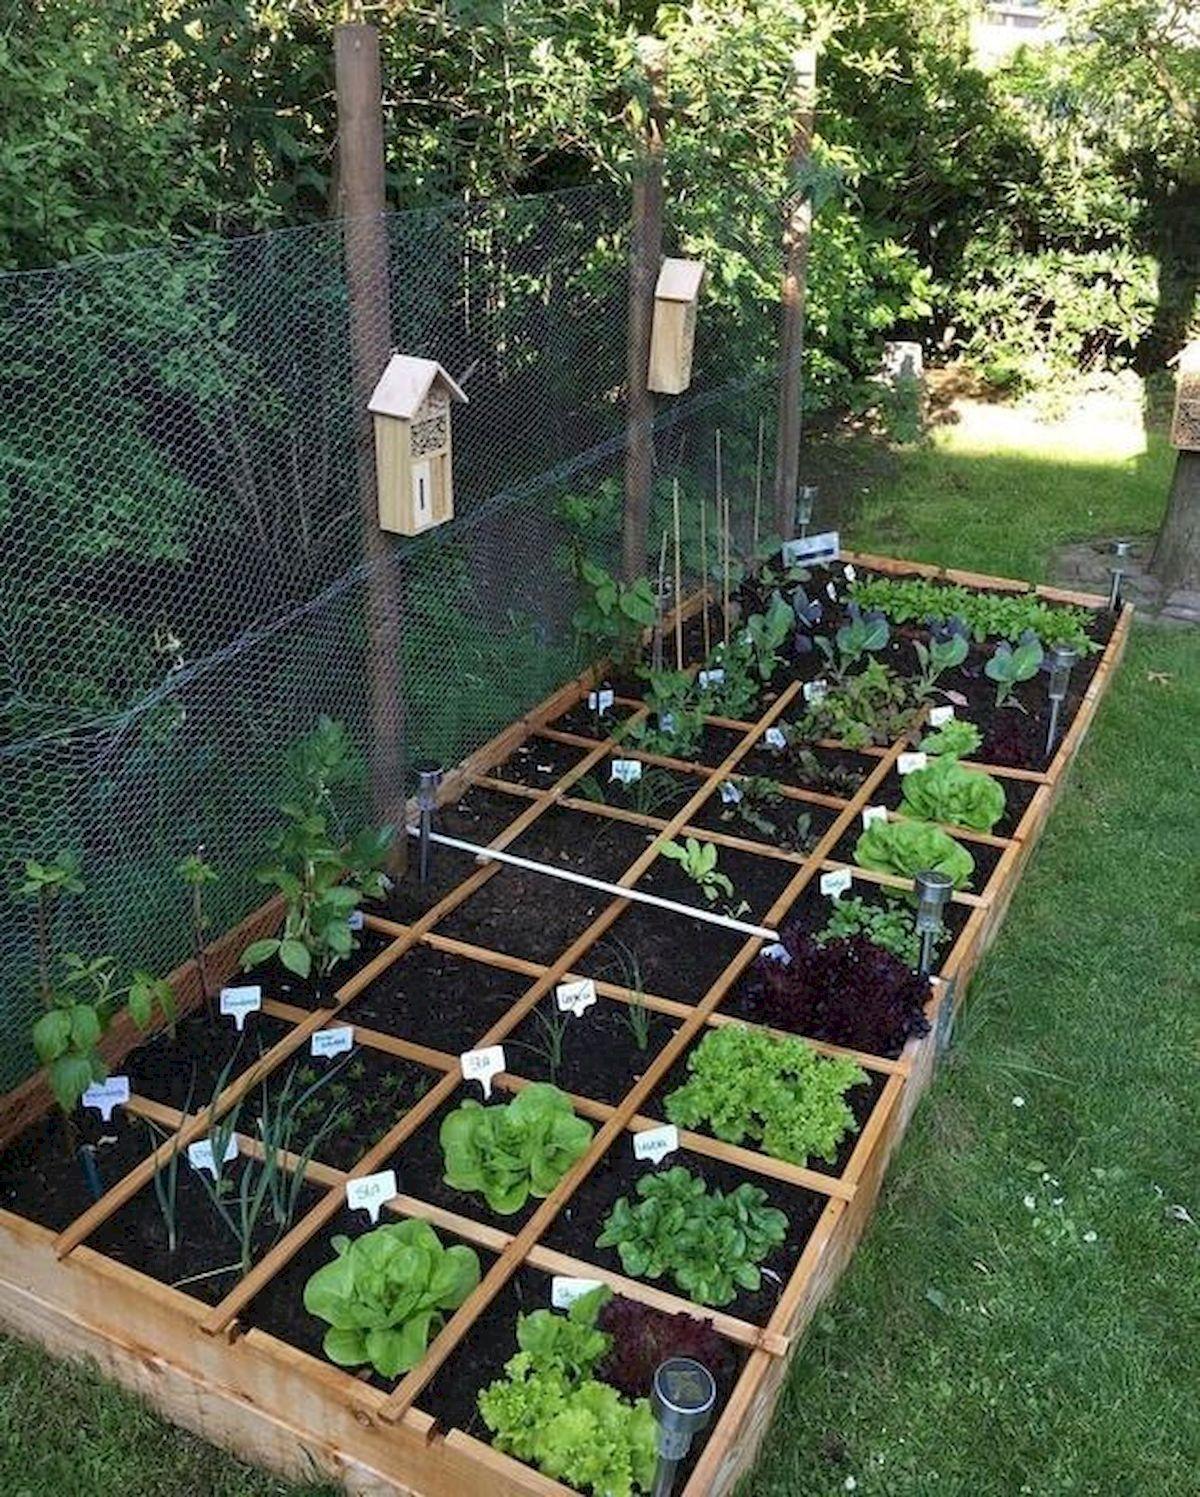 Garden Beds Design Ideas For Summer Vegetable garden for